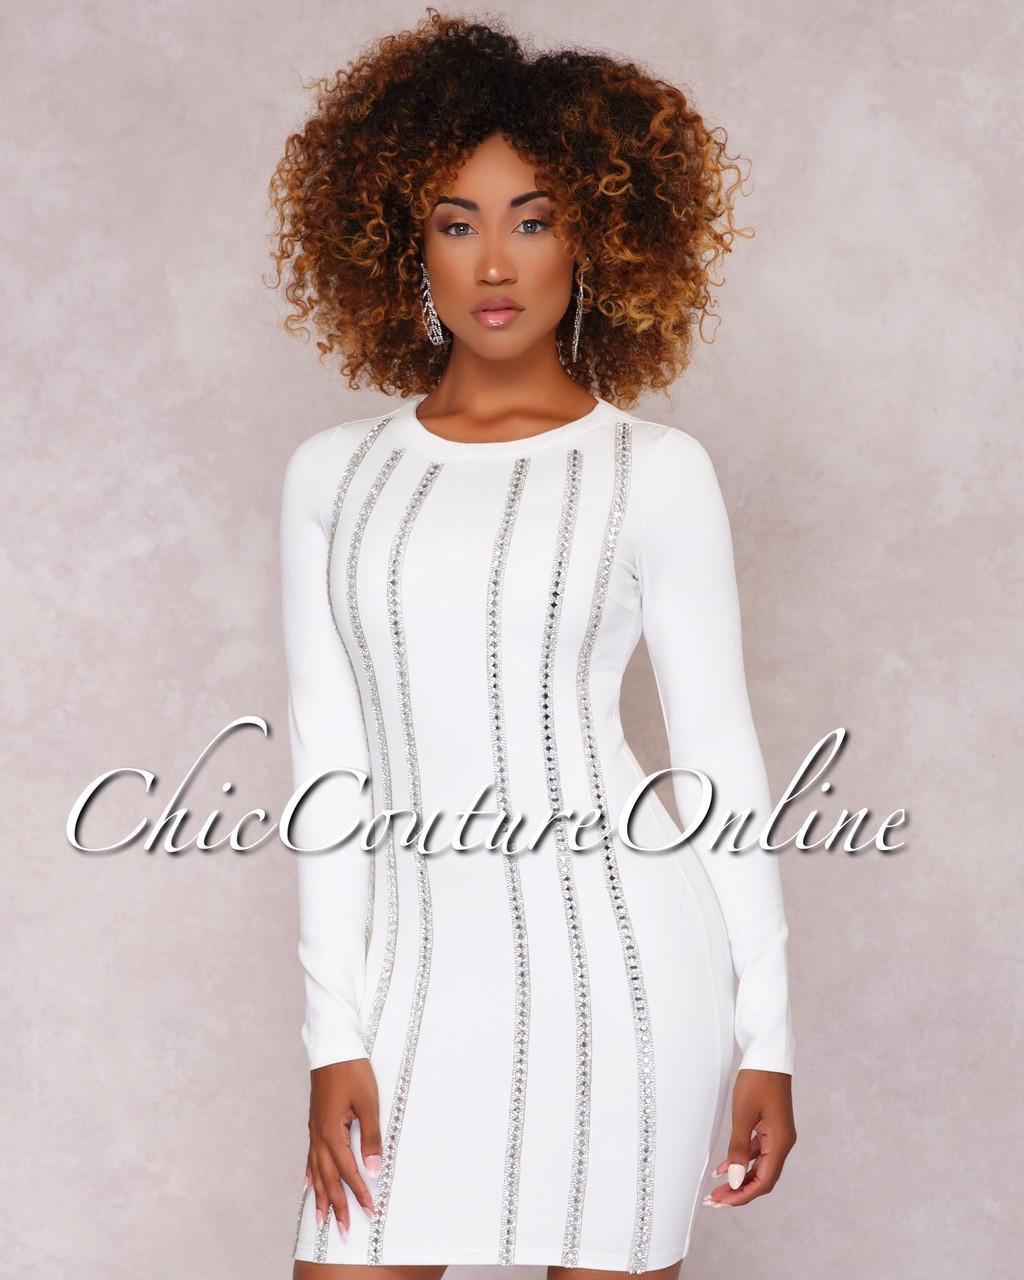 26faf1b30c6 Imani White Rhinestone Embellished Mini Dress. Price   70.00. Image 1